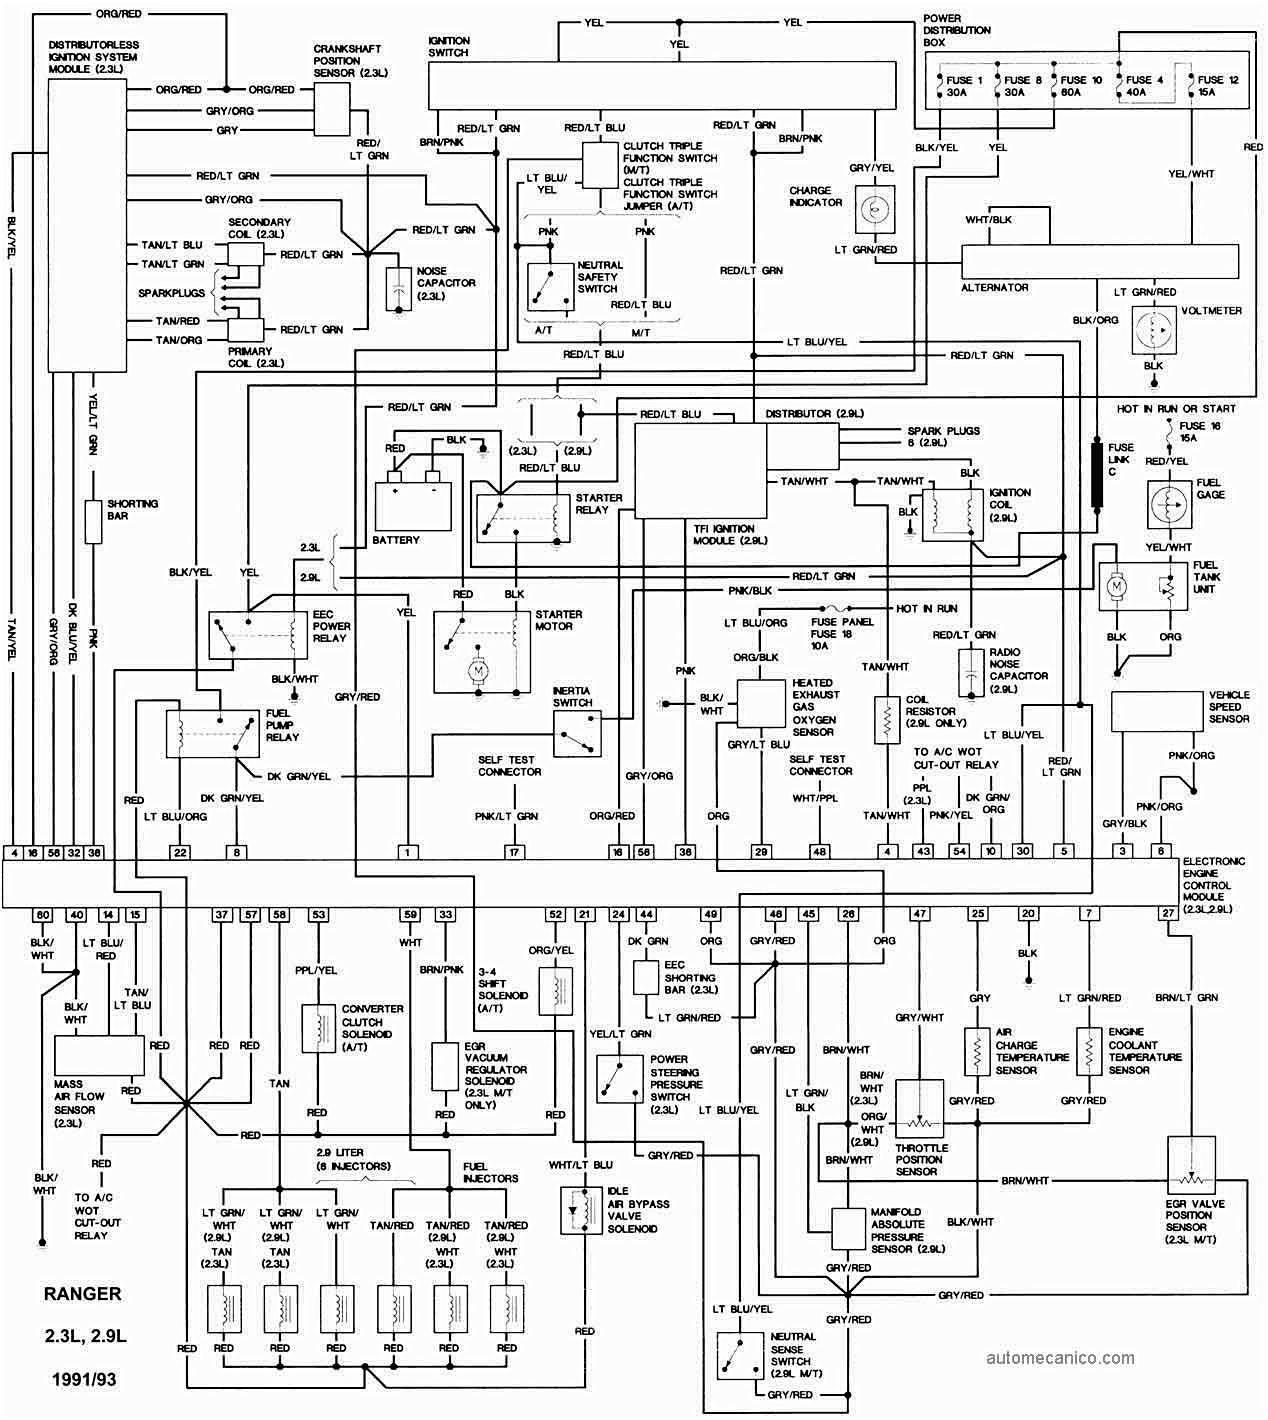 wc_1865] ford ranger engine diagram together with 94 ford ranger wiring  diagram schematic wiring  ponge bocep mohammedshrine librar wiring 101